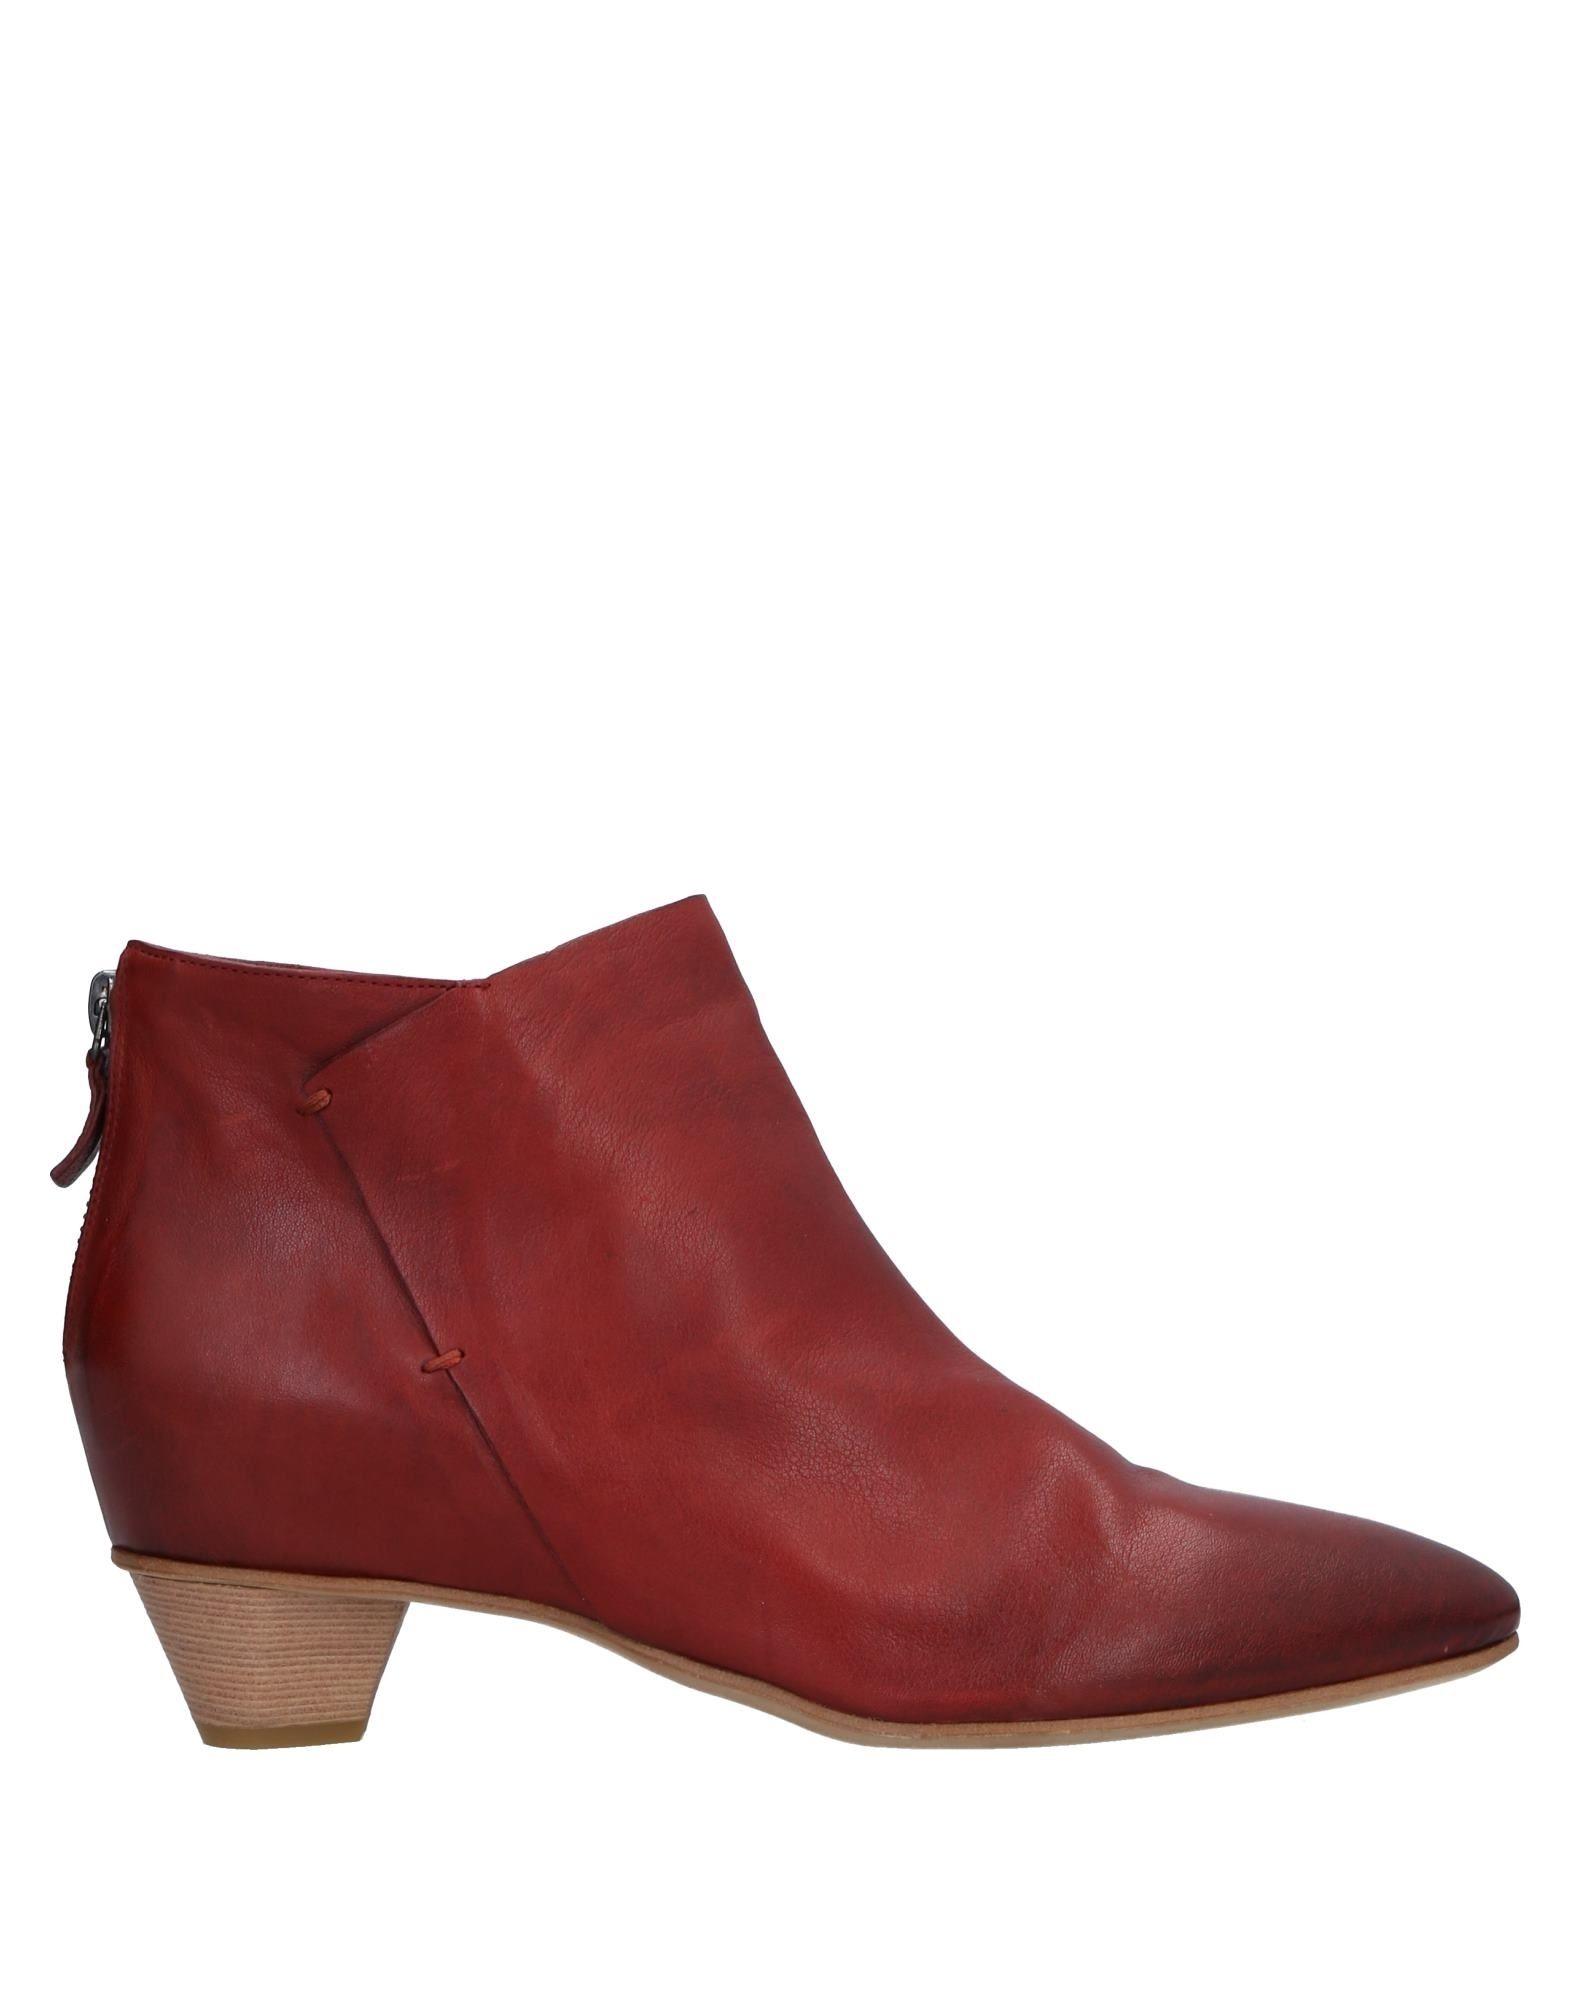 Rabatt Schuhe Roberto Del Carlo Stiefelette Damen  11543706SN